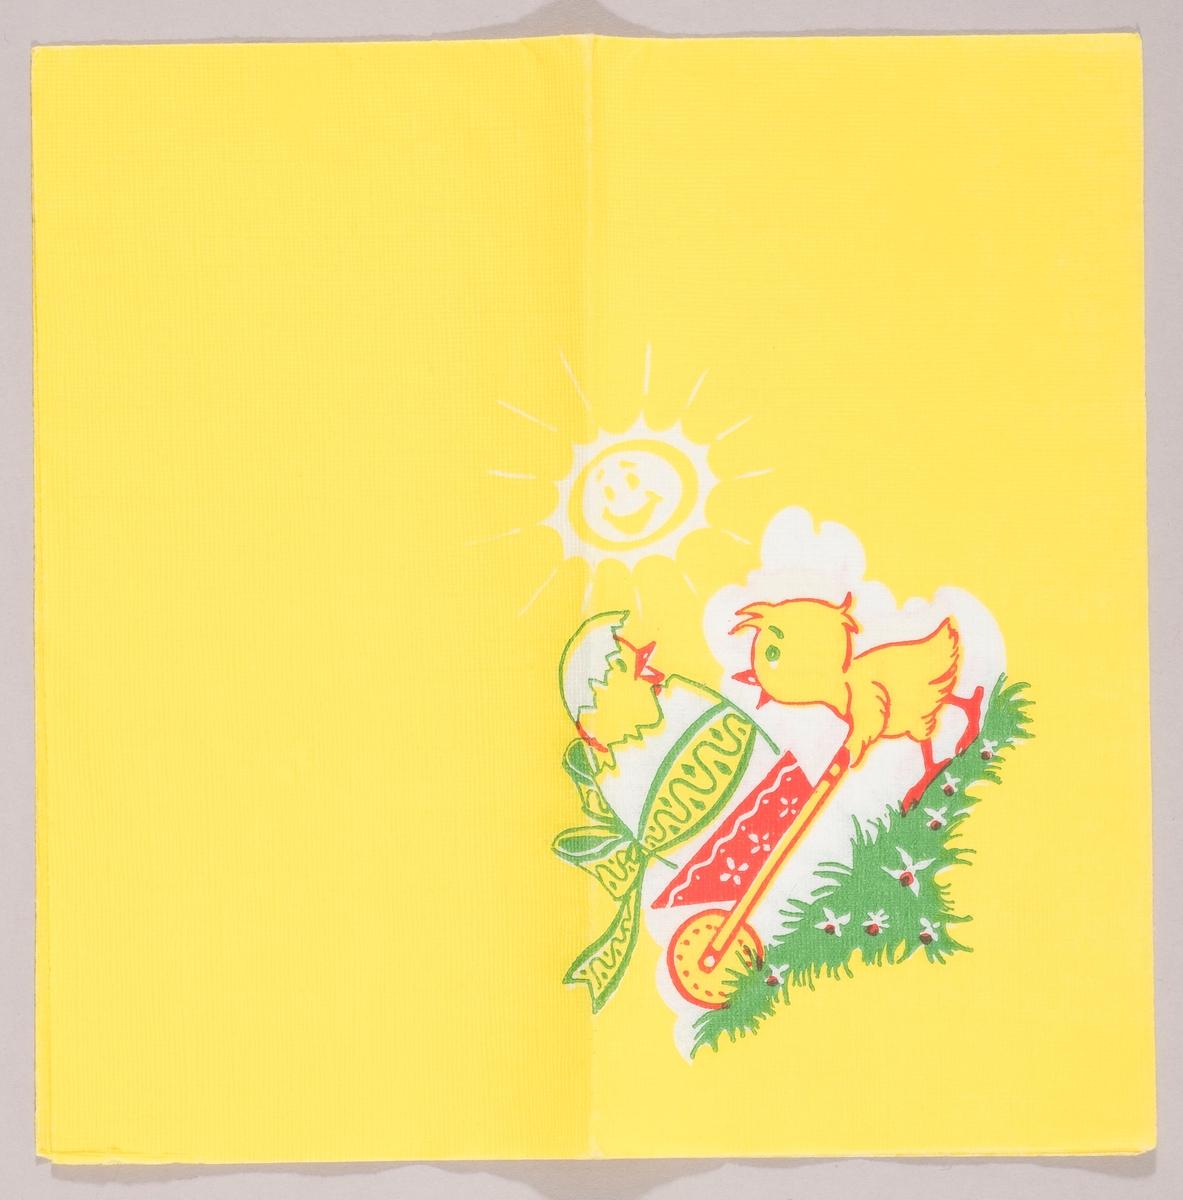 En kylling kjører med en trille hvorpå det er en kylling i et påskeegg med sløyfe rundt. Påskesolen stråler i bakgrunnen.